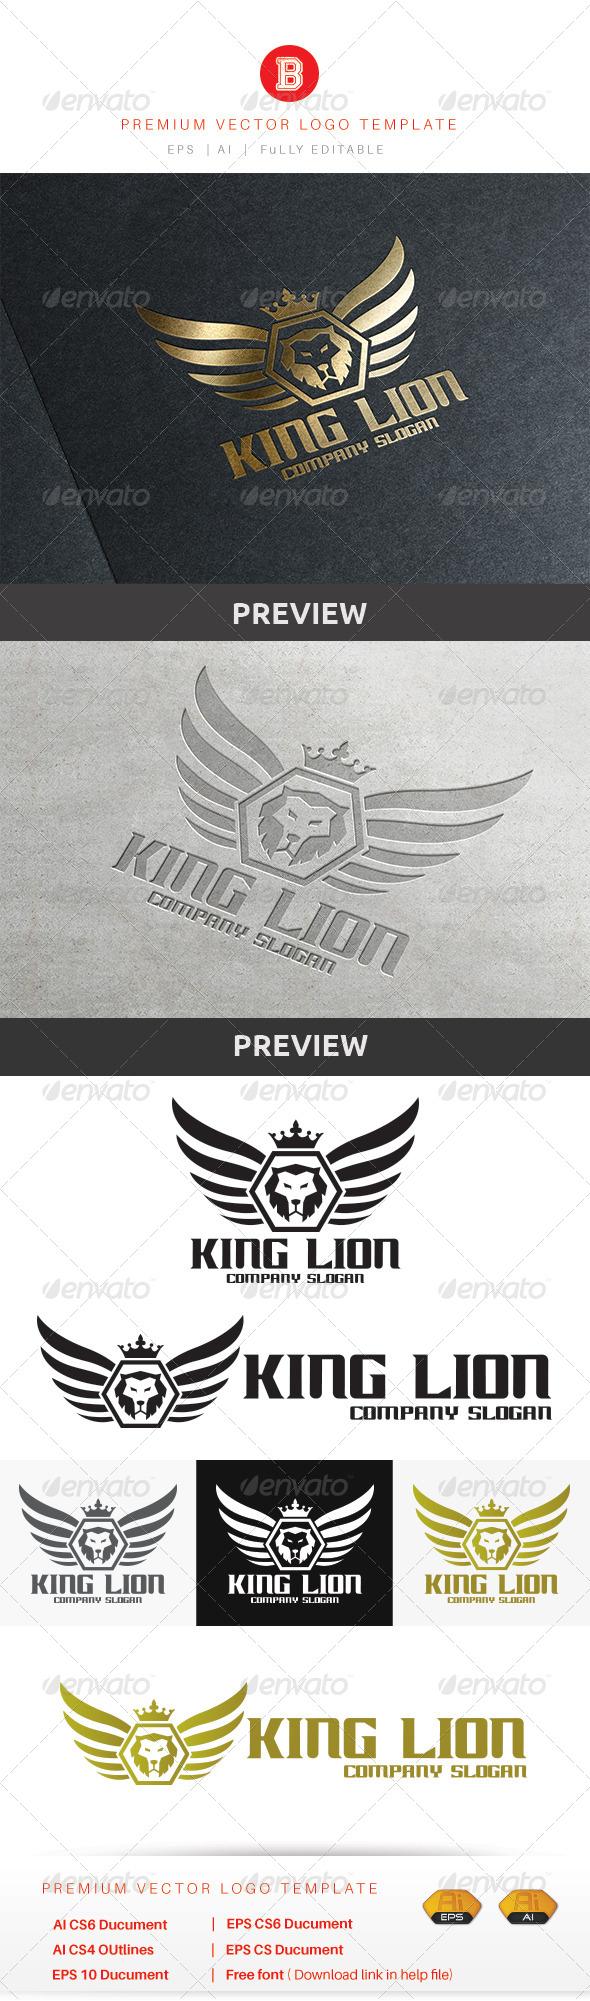 GraphicRiver King Lion 8679763